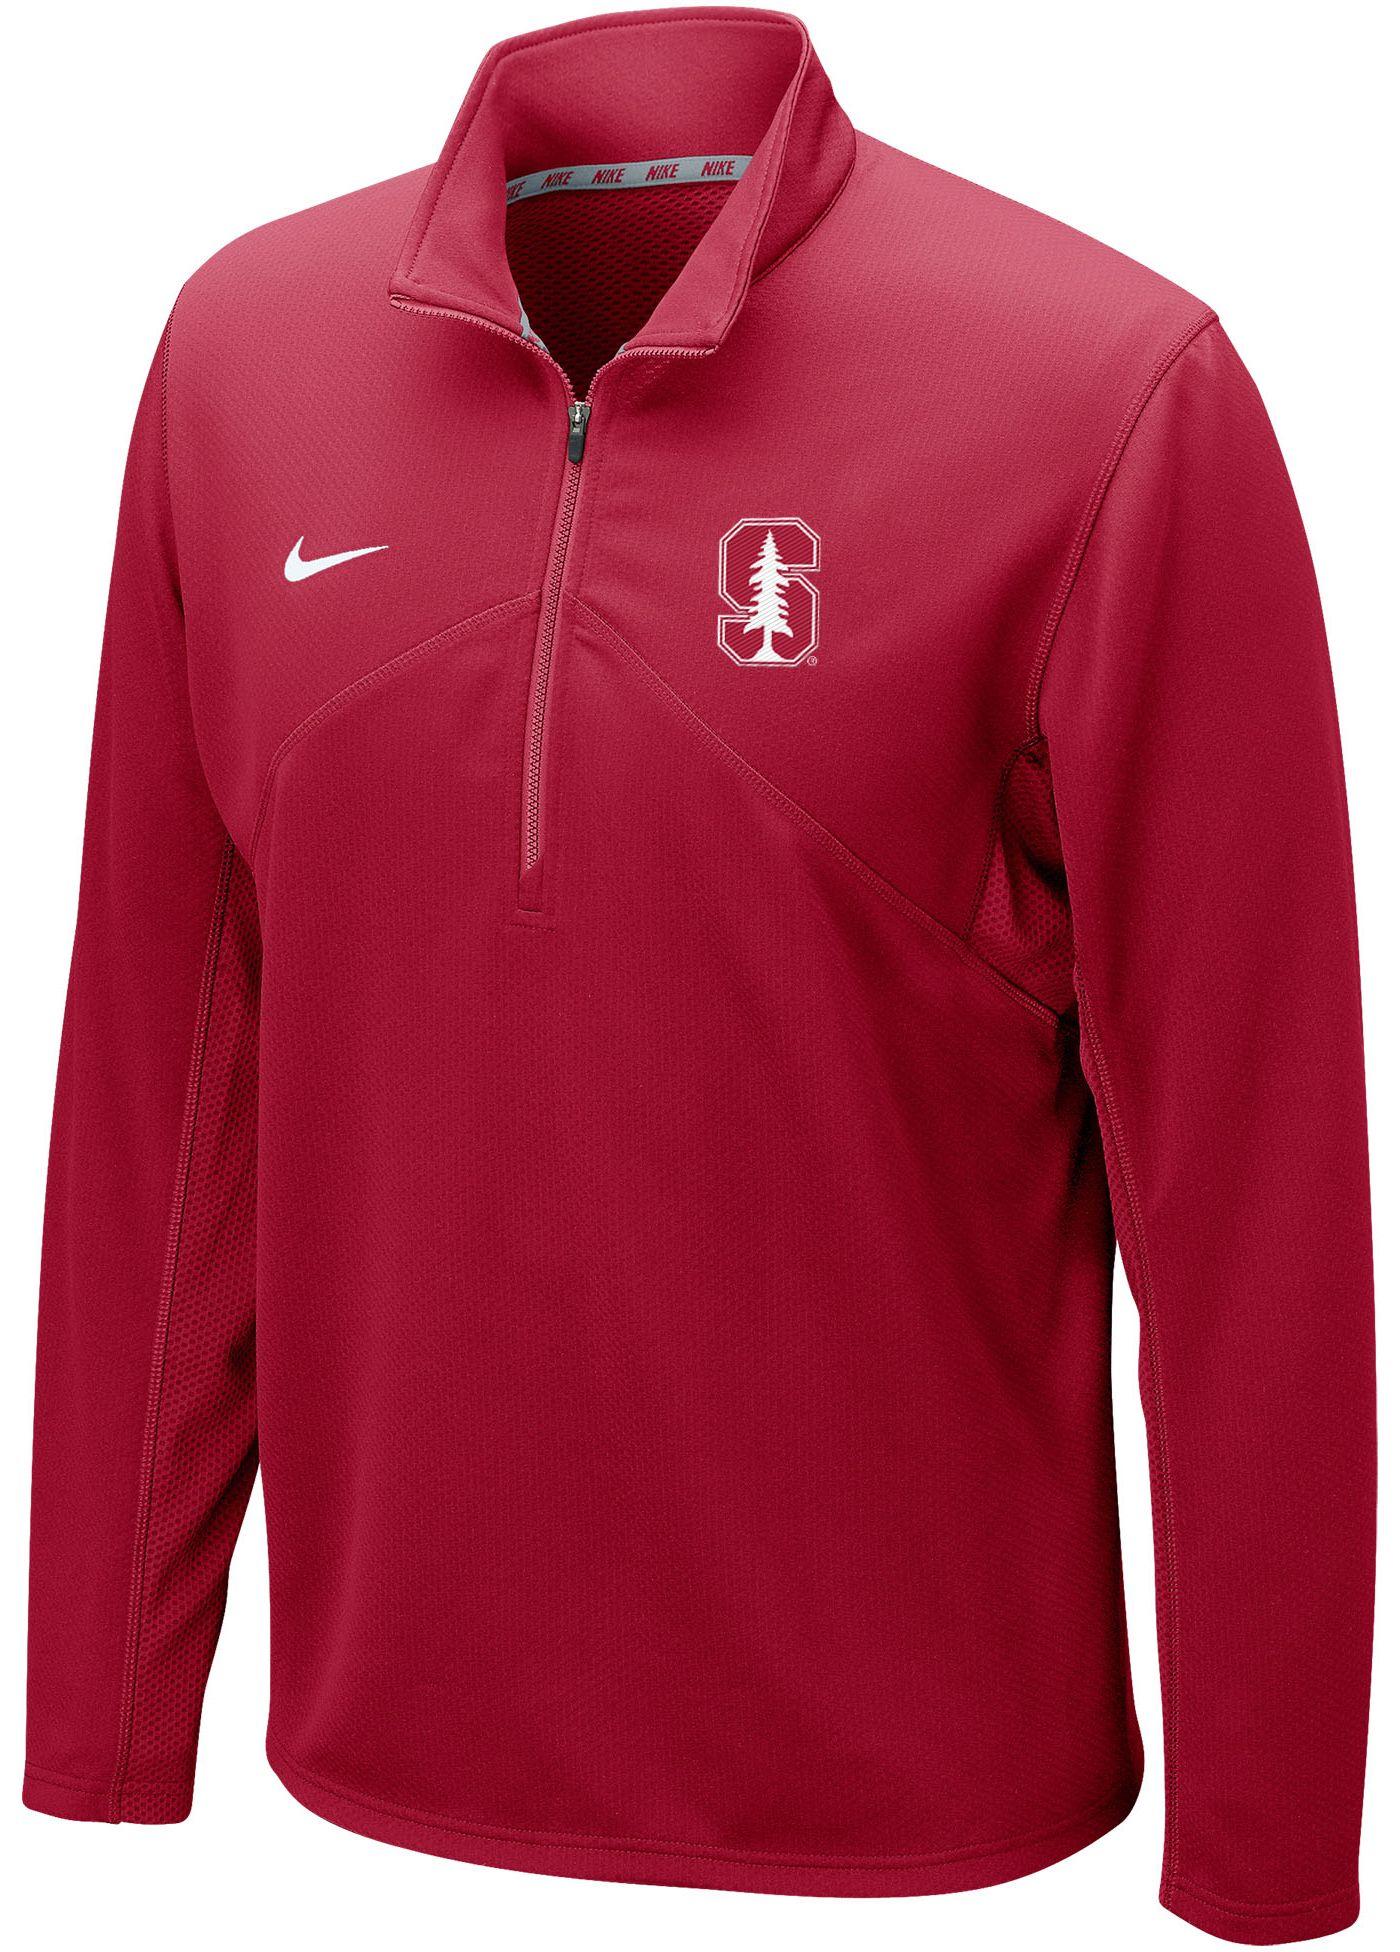 Nike Men's Stanford Cardinal Dri-FIT Training Quarter-Zip Cardinal Shirt